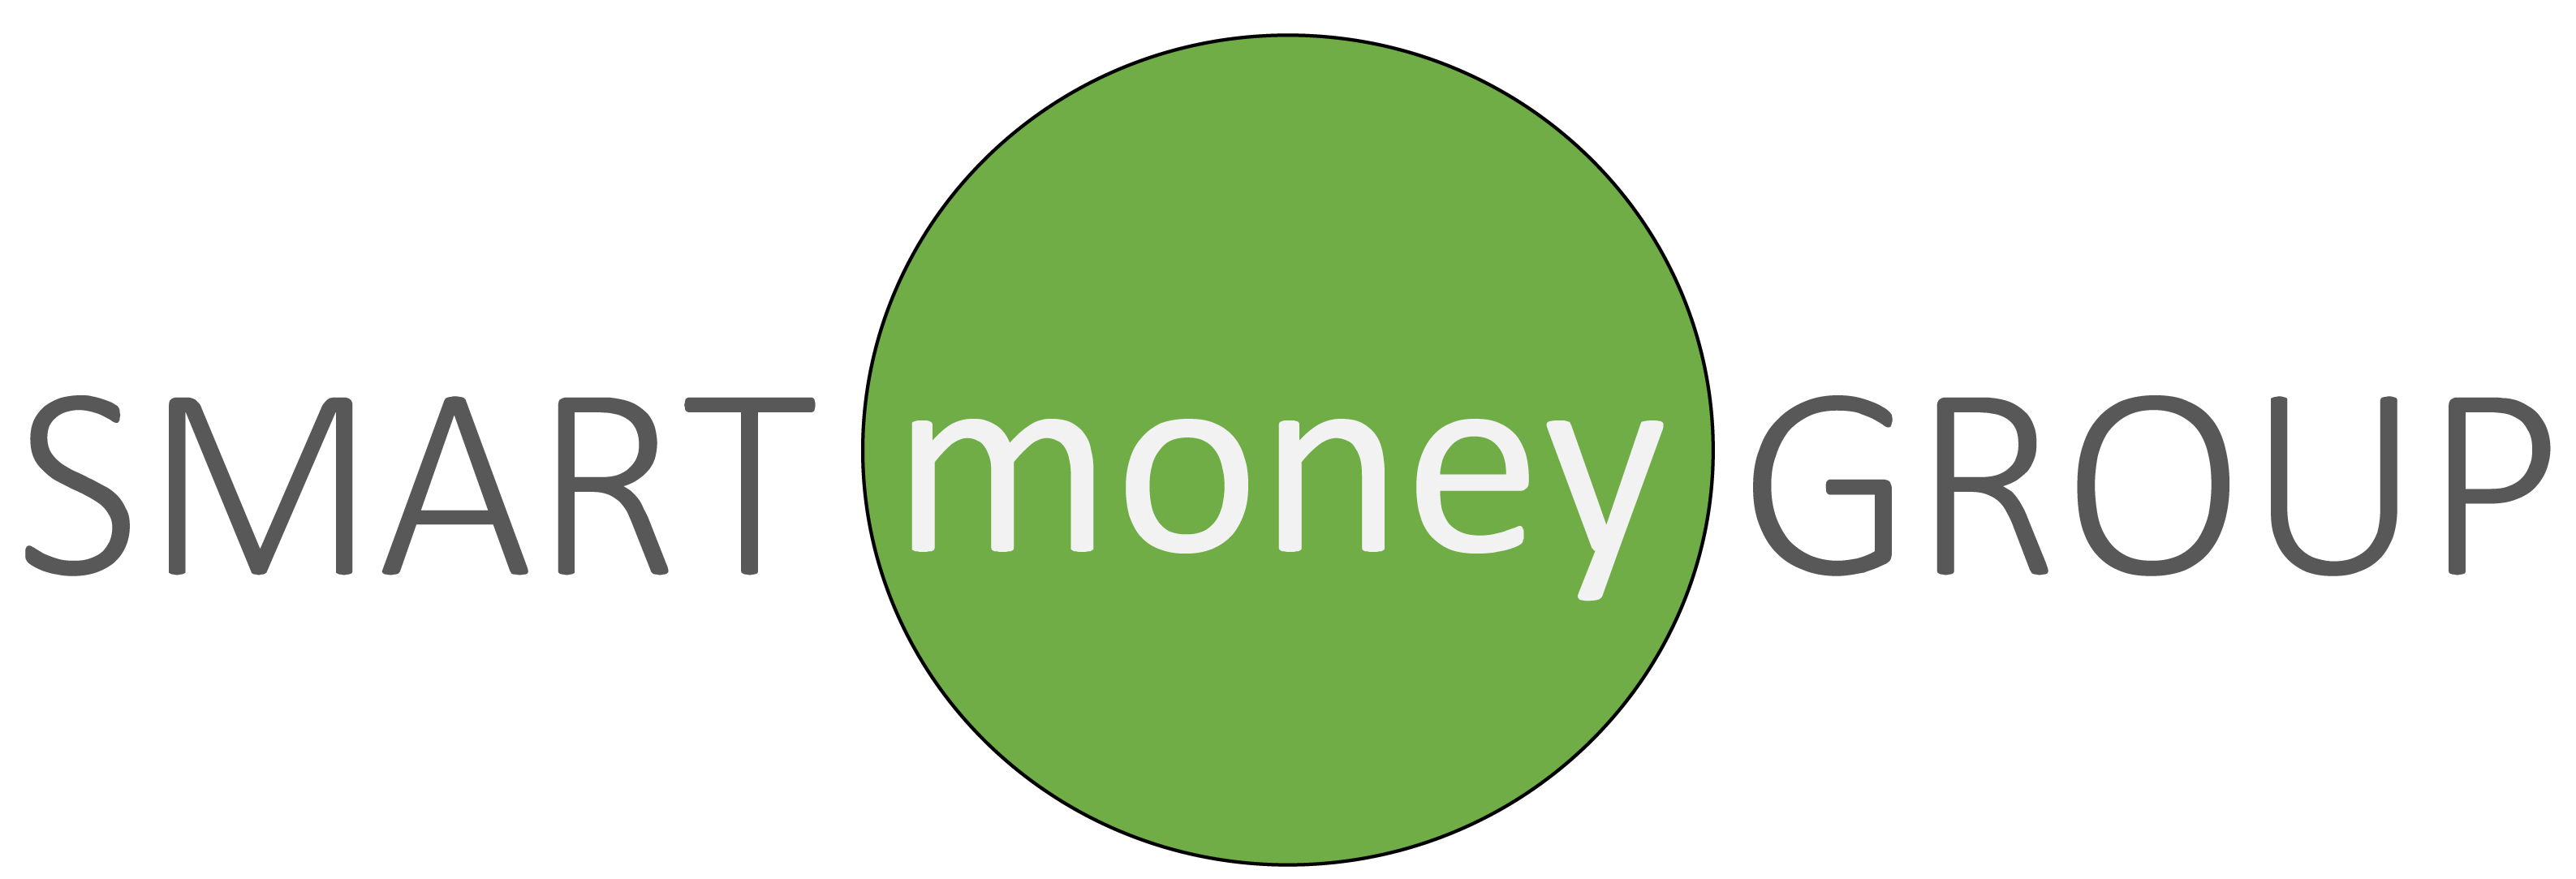 Smart Money Group Logo